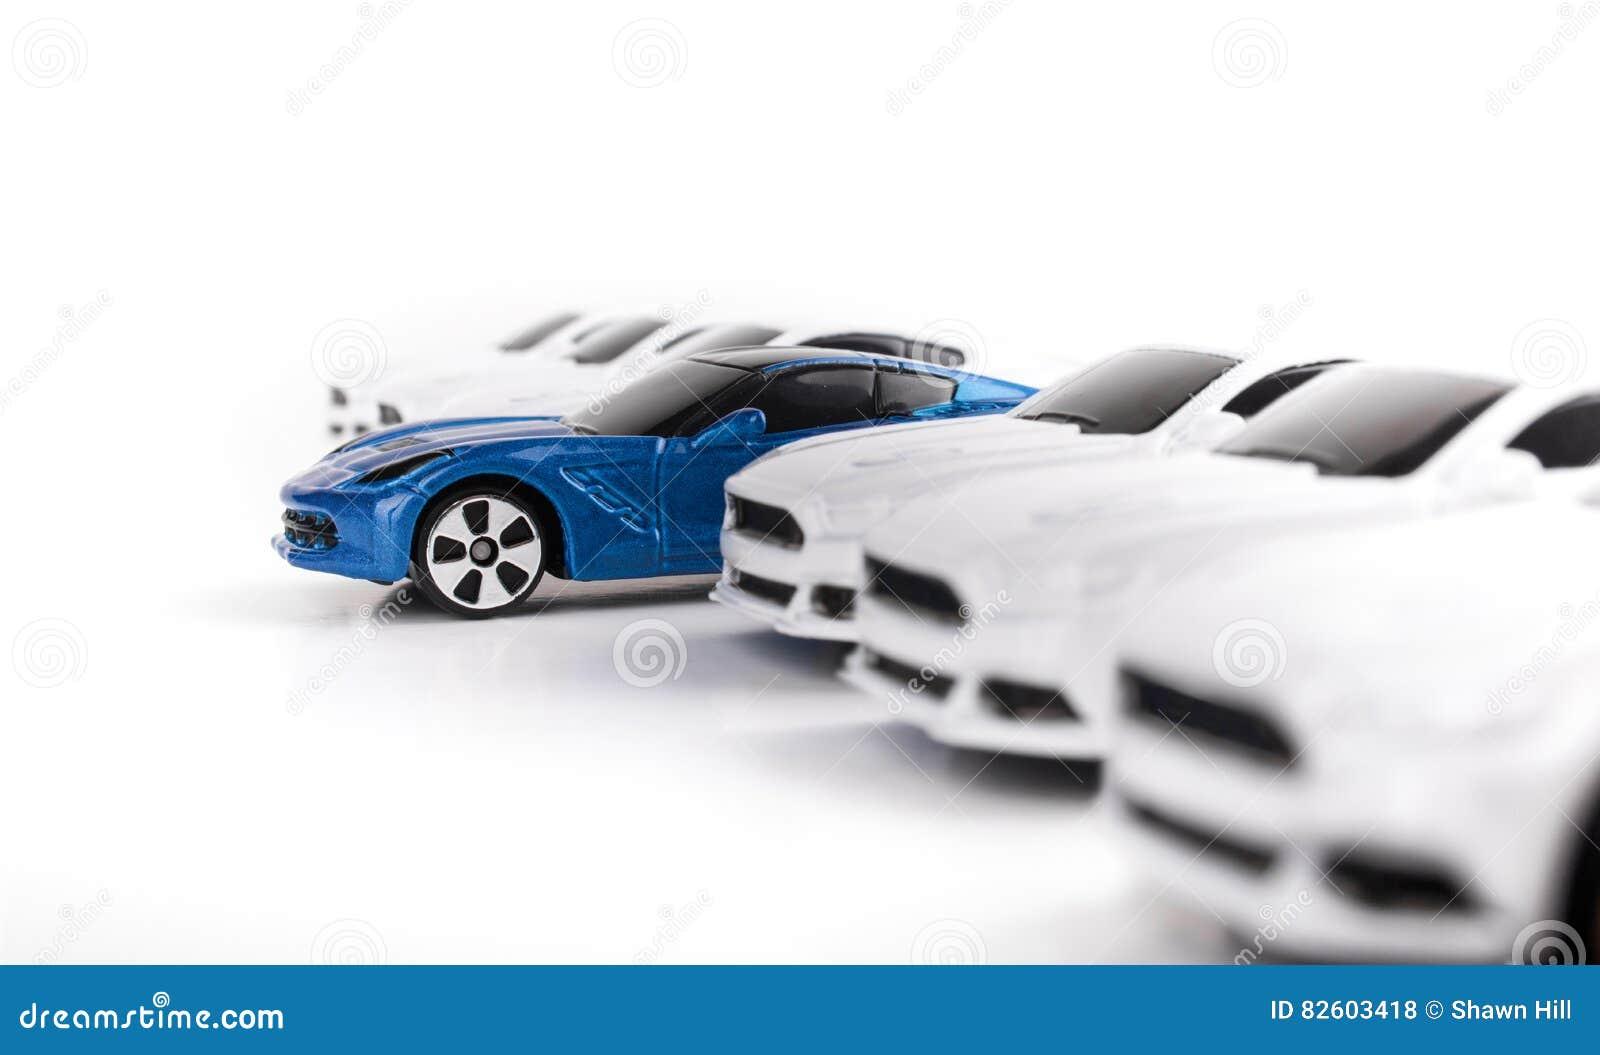 L'autre Cars Photo Out Among Standing Toy Car Plusieurs Stock oCxBrdeW